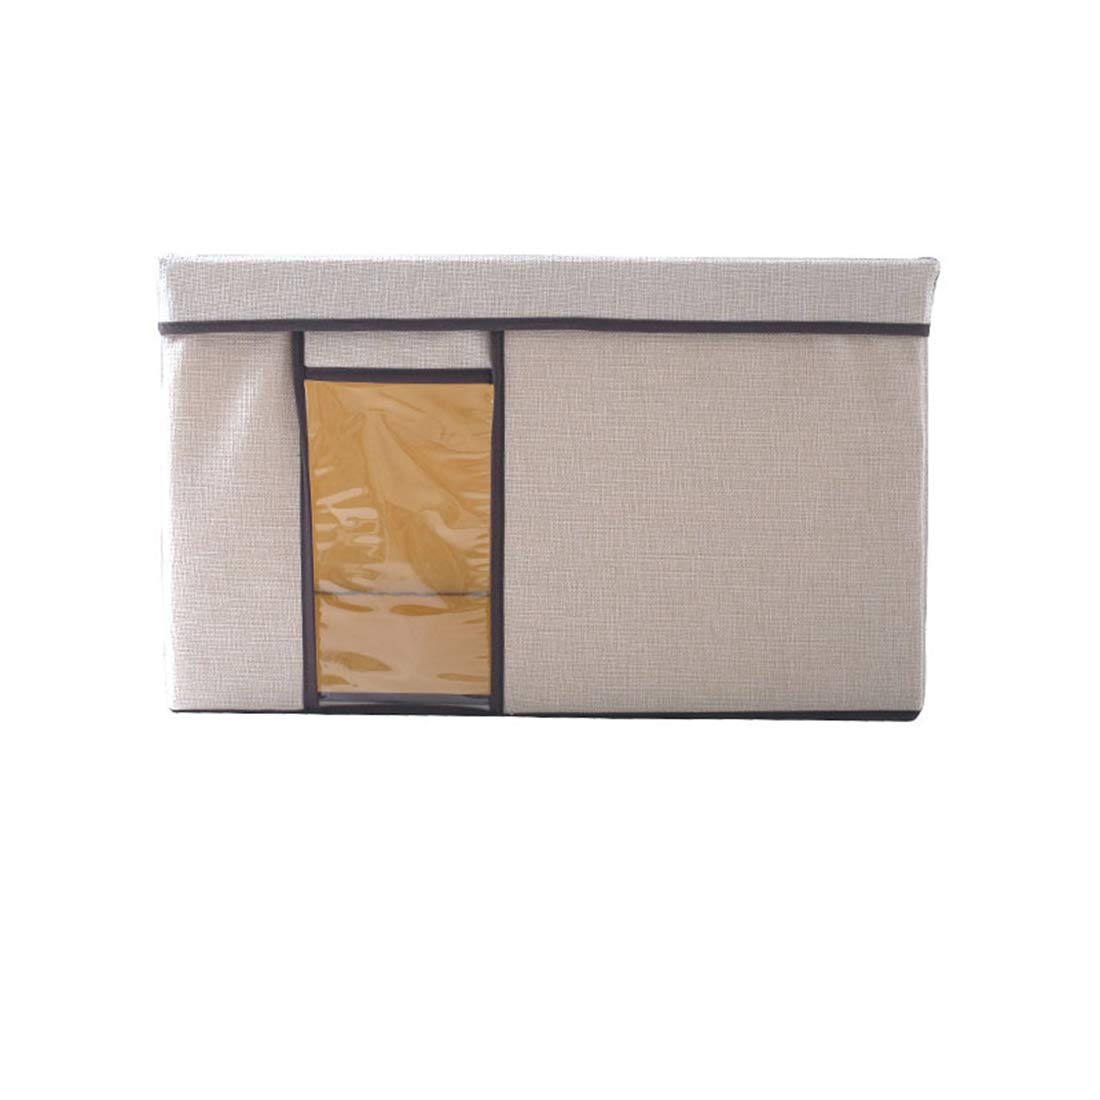 MHKBD-JP服キルト収納ボックスパースペクティブウィンドウ宝箱洗える家庭用模造リネン収納ボックス事務用品書籍雑貨玩具収納ボックス 収納ケース (色 : Apricot Small) B07T63LJH7 Apricot Small